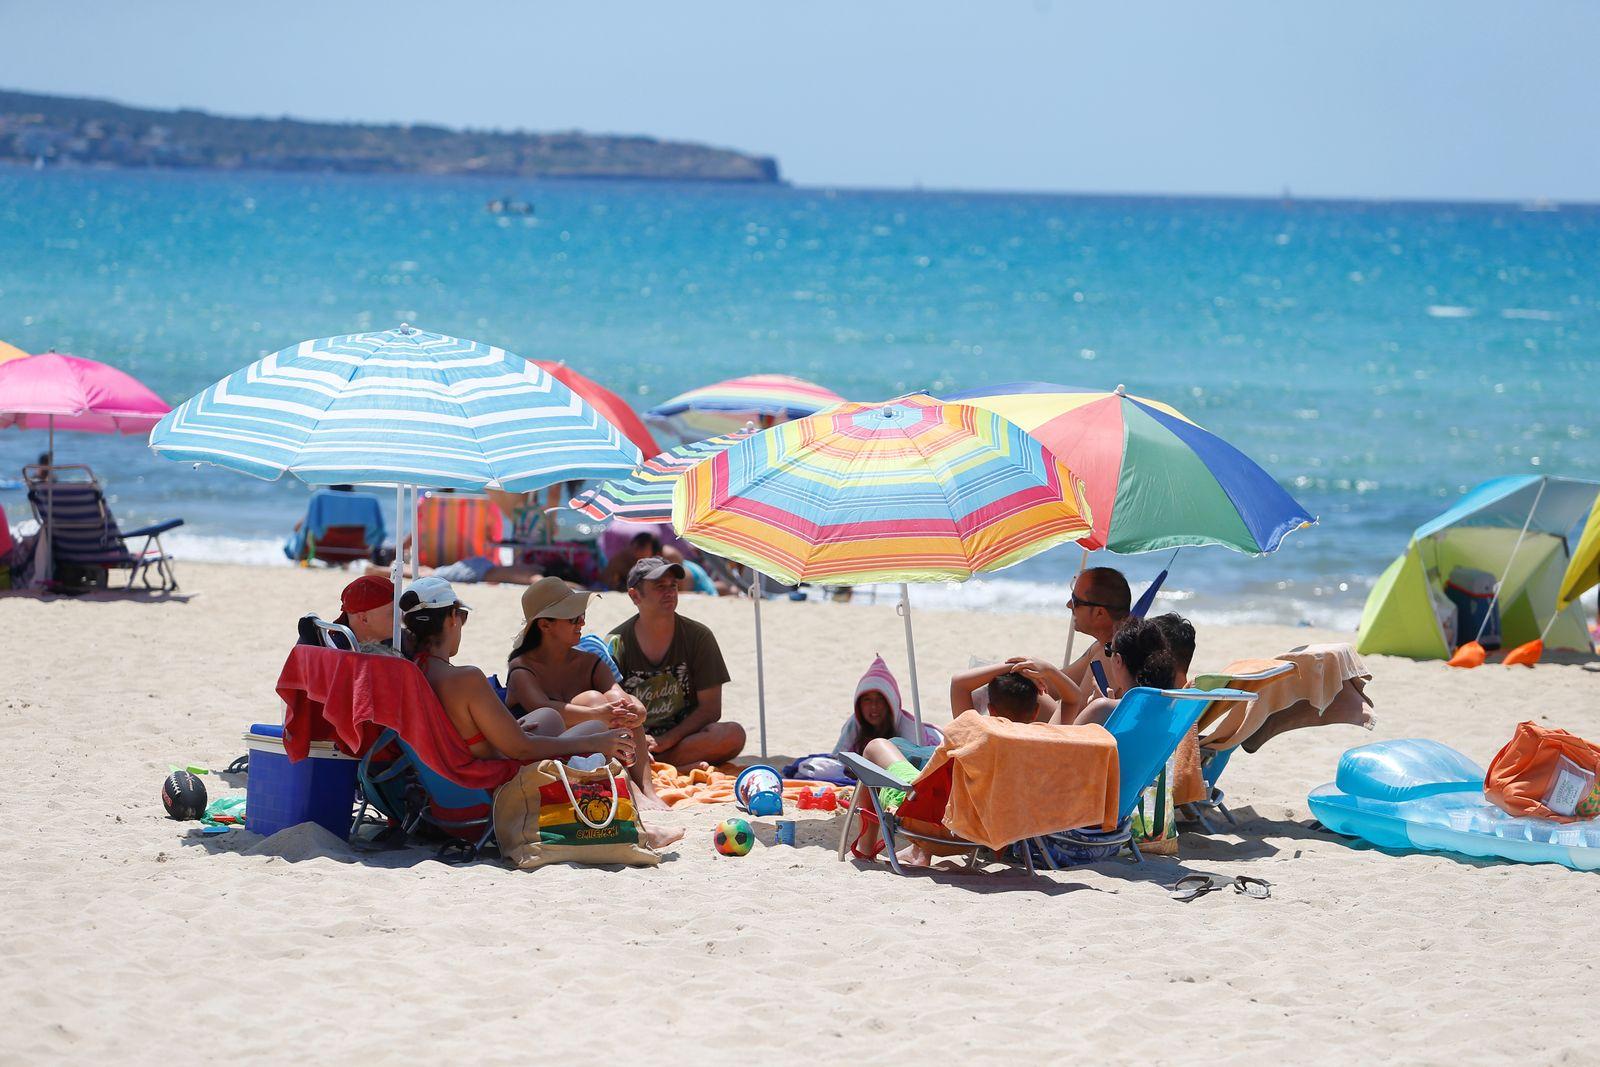 People sunbathe in Playa de Palma beach in Mallorca